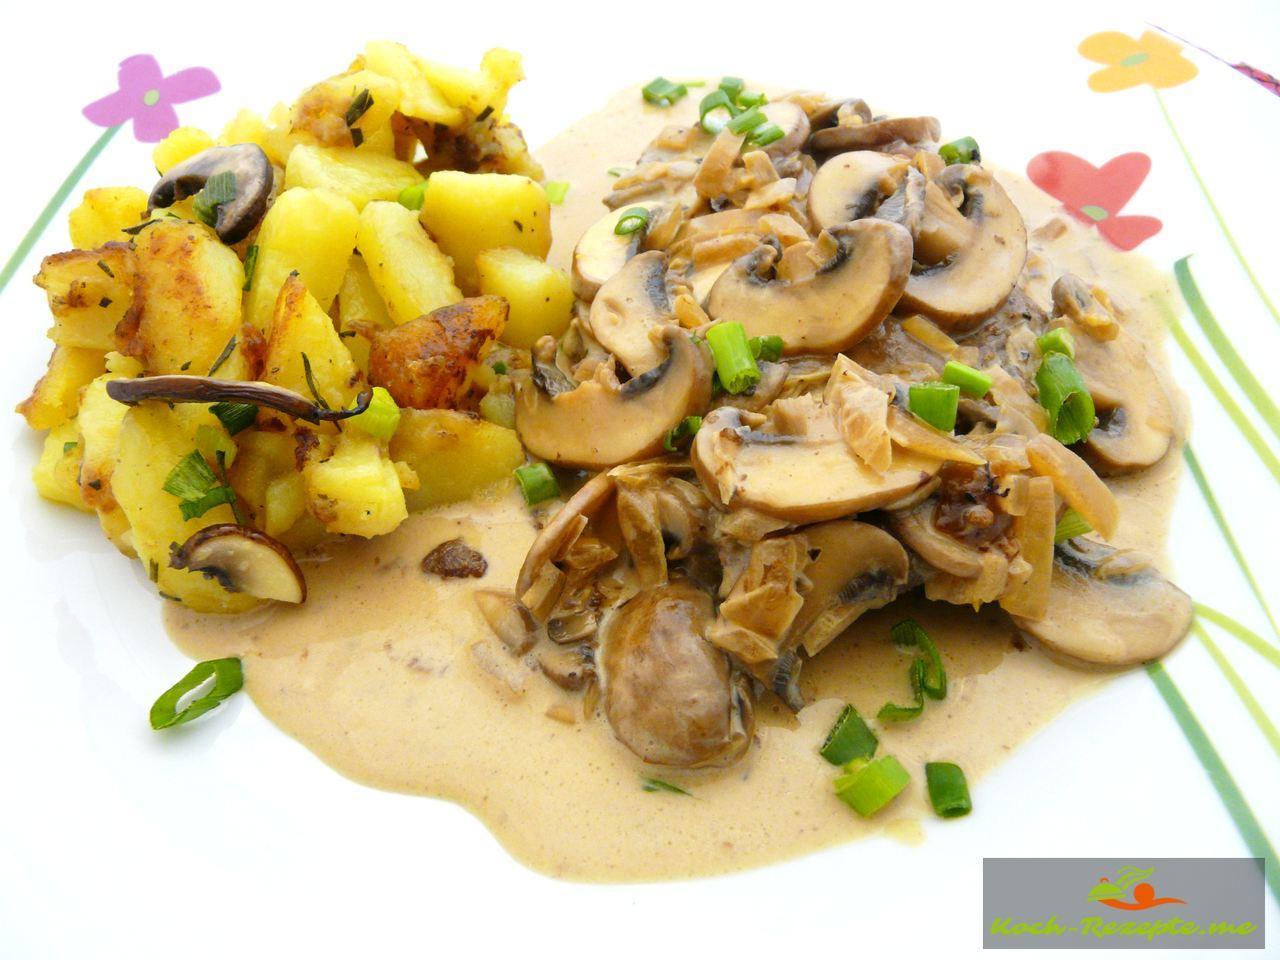 leckere champignon sahne schnitzel backofenkartoffeln. Black Bedroom Furniture Sets. Home Design Ideas